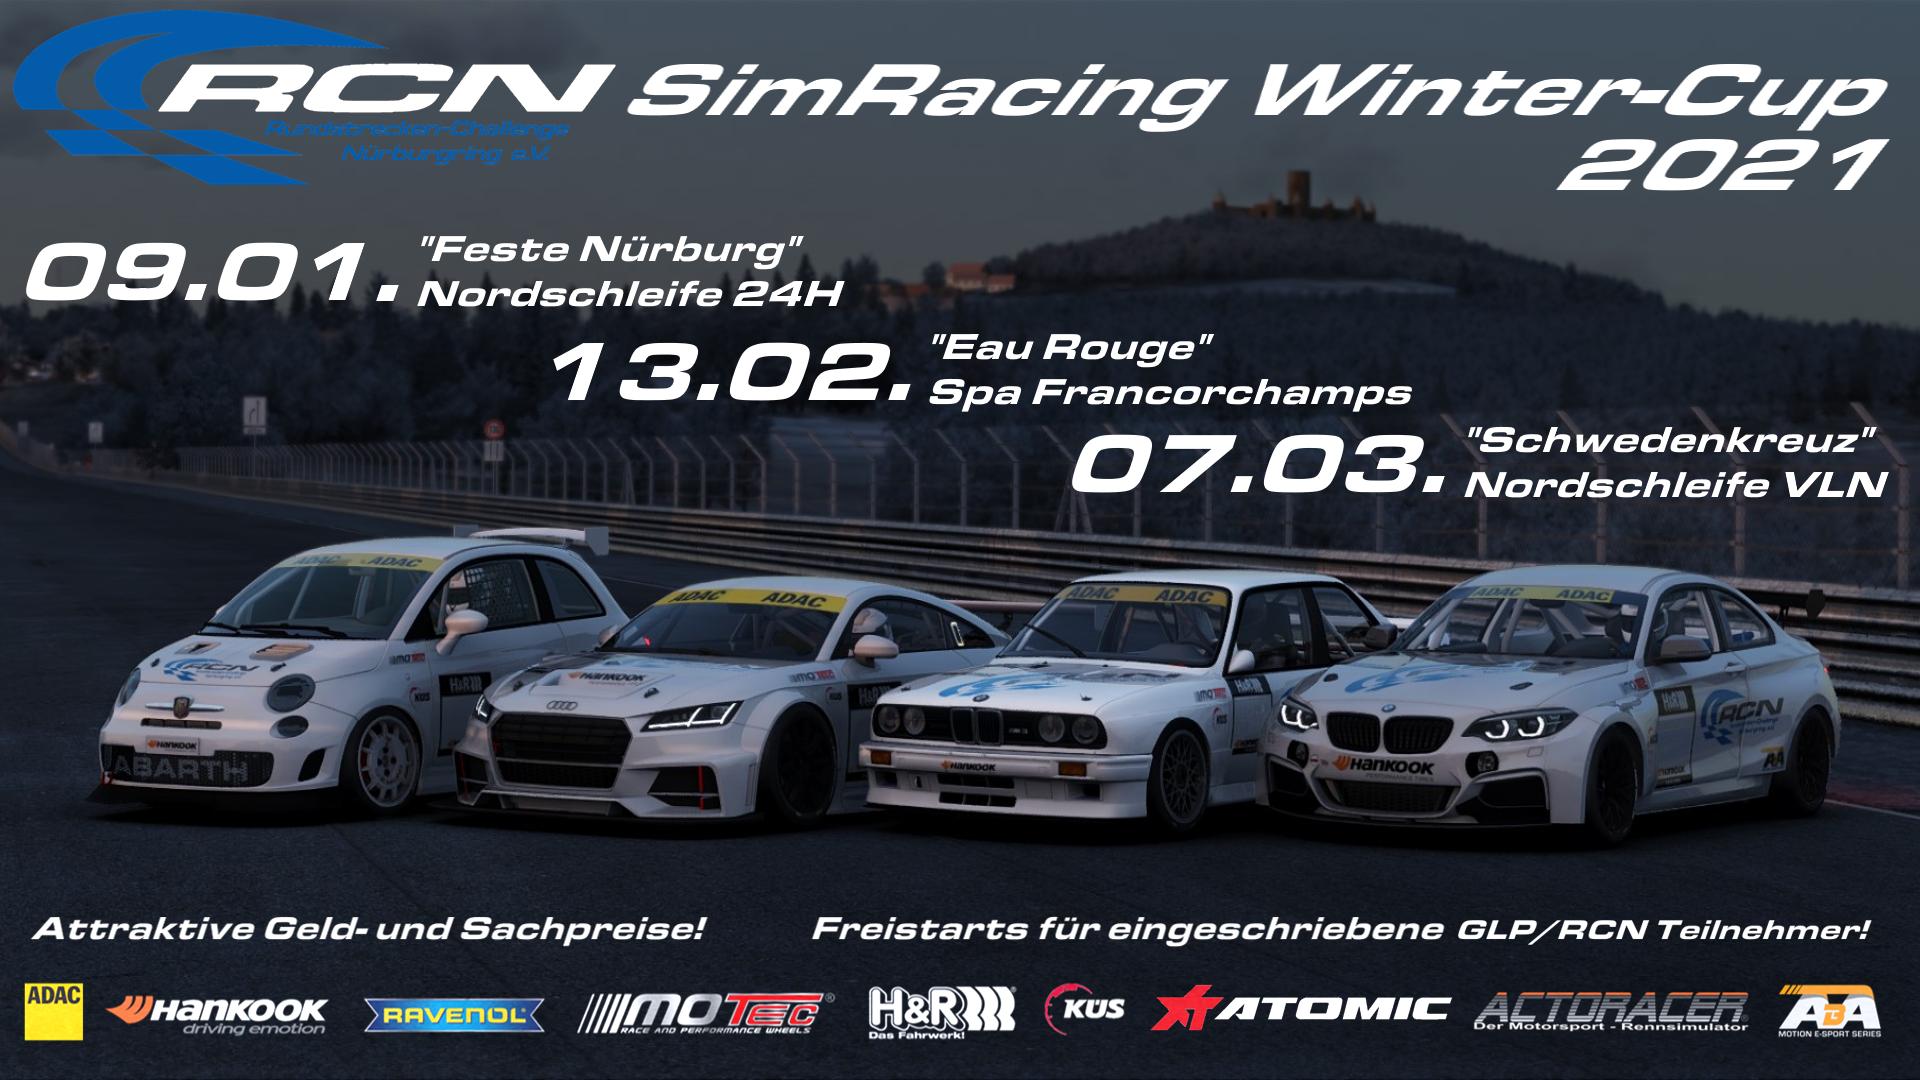 RCN SimRacing Winter-Cup 2021